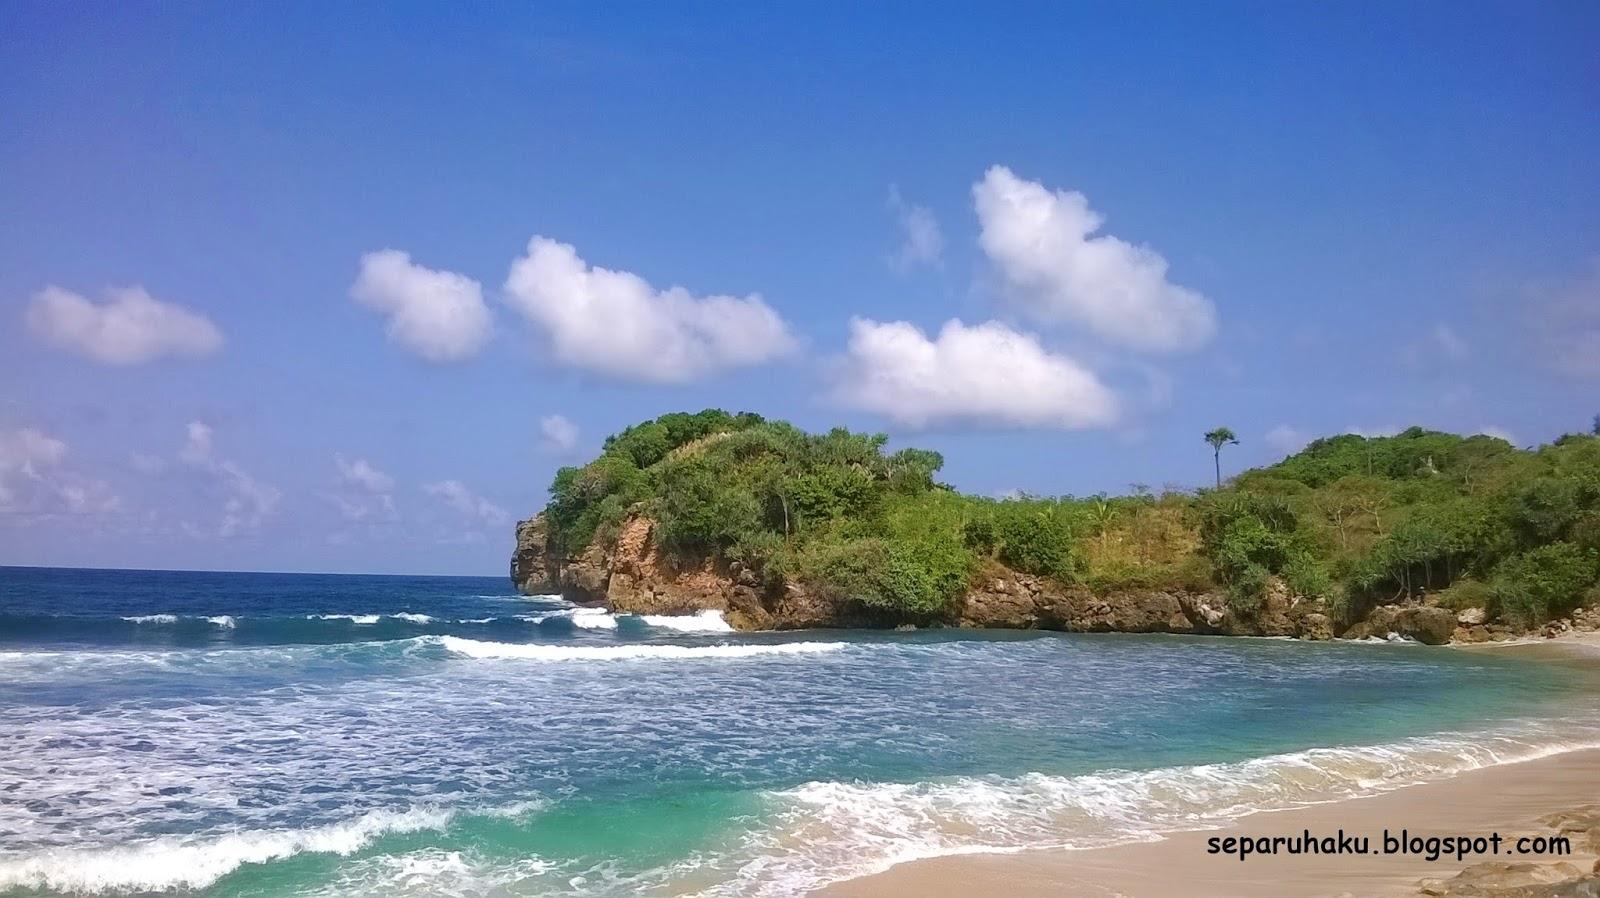 Pantai Peh Pulo Raja Ampat Nya Blitar Jawa Timur Separuh Aku